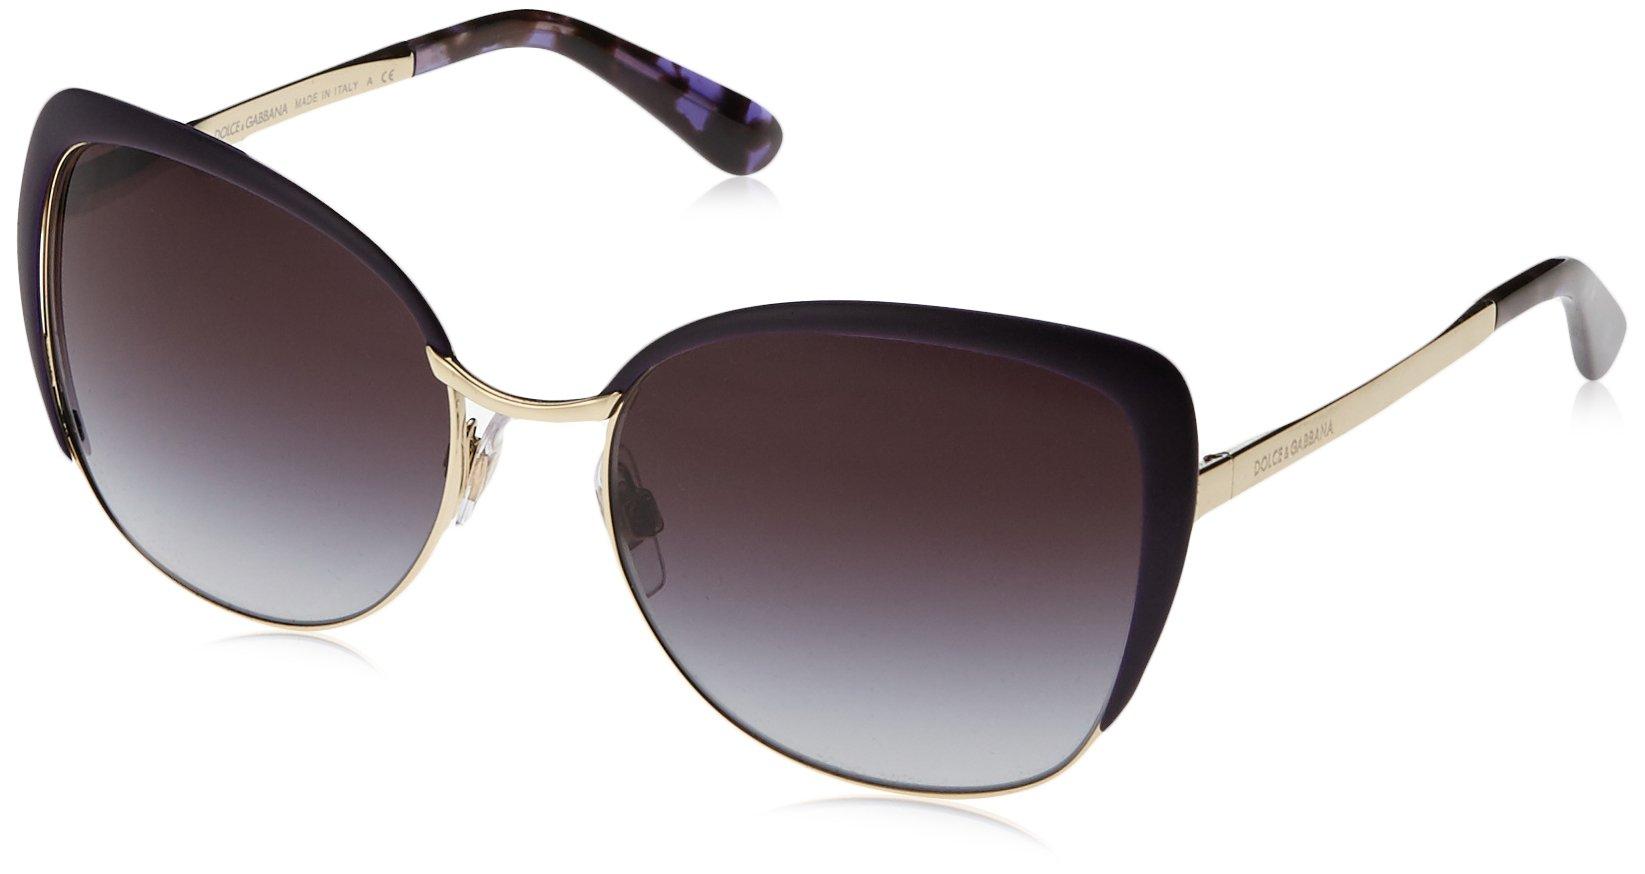 gradientFemme Gold Gabbana 12538g 0dg2143 57 violet De LunettesOrpale Dolceamp; Montures UzpGqSMV